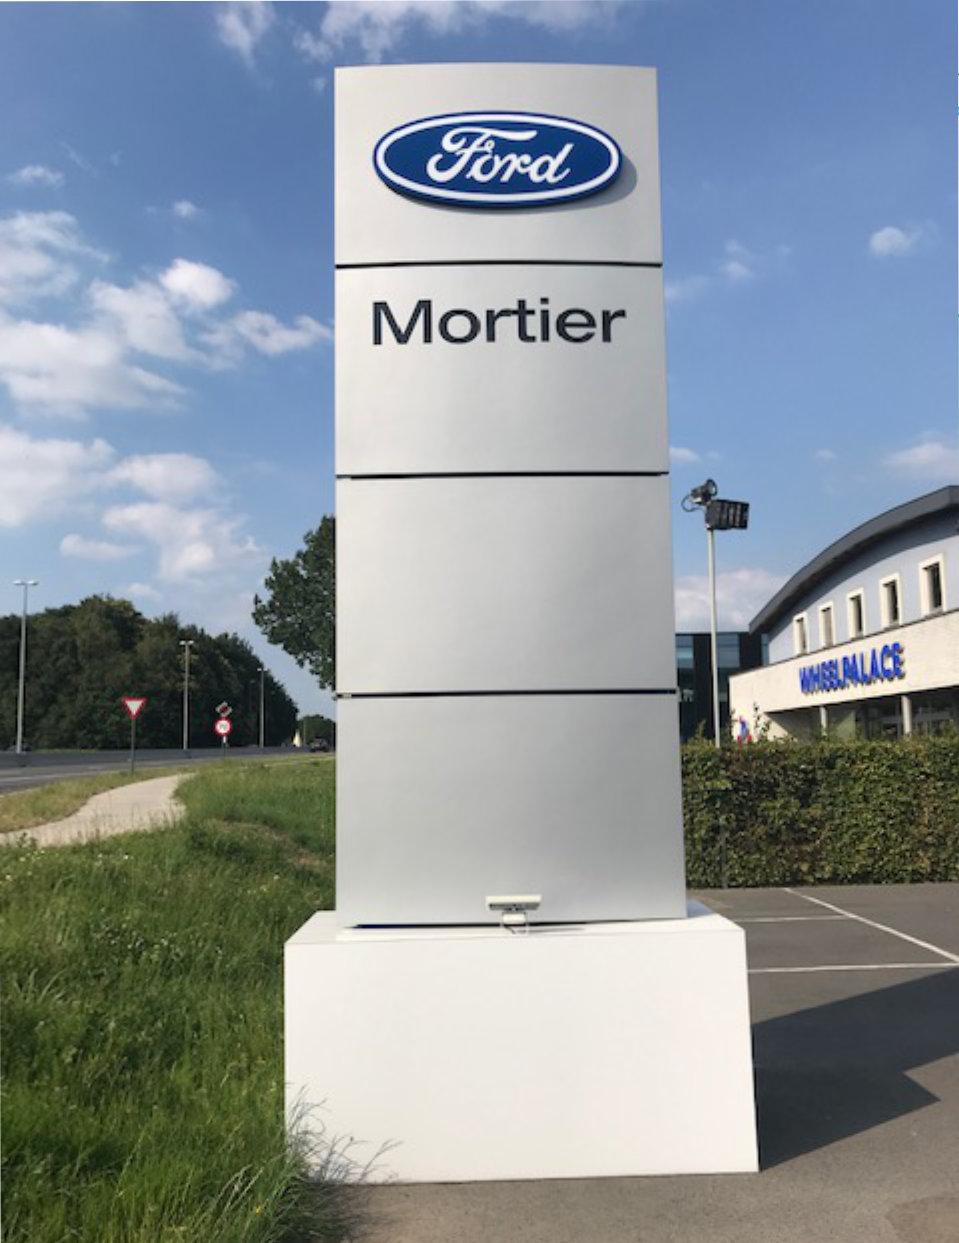 Garage Mortier